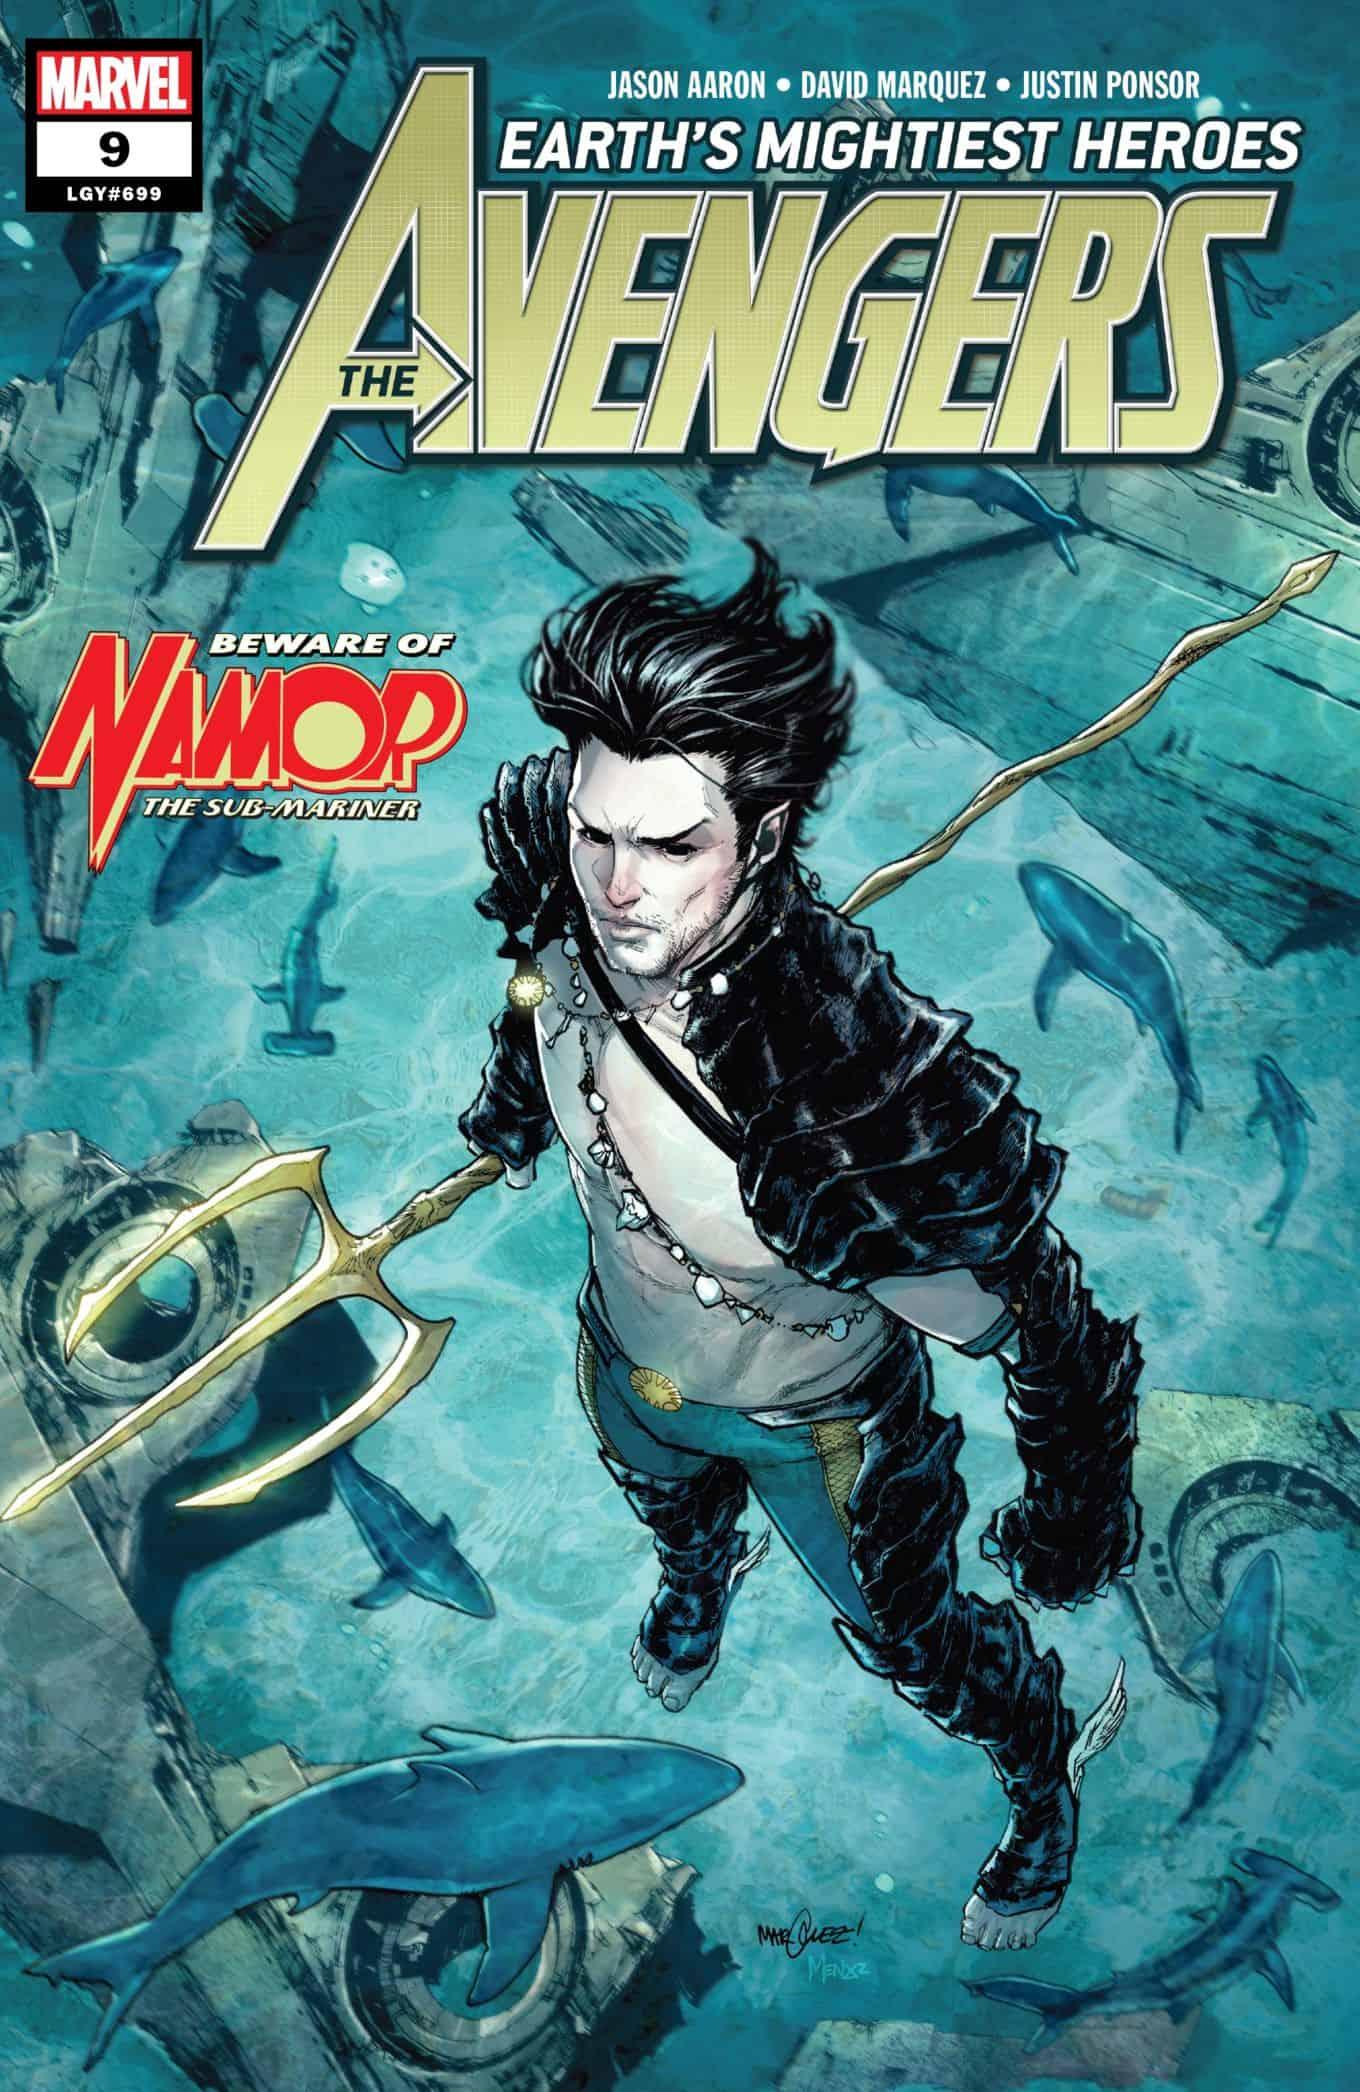 The Avengers: Marvel Comics Universe & Avengers #9 Spoilers: Namor